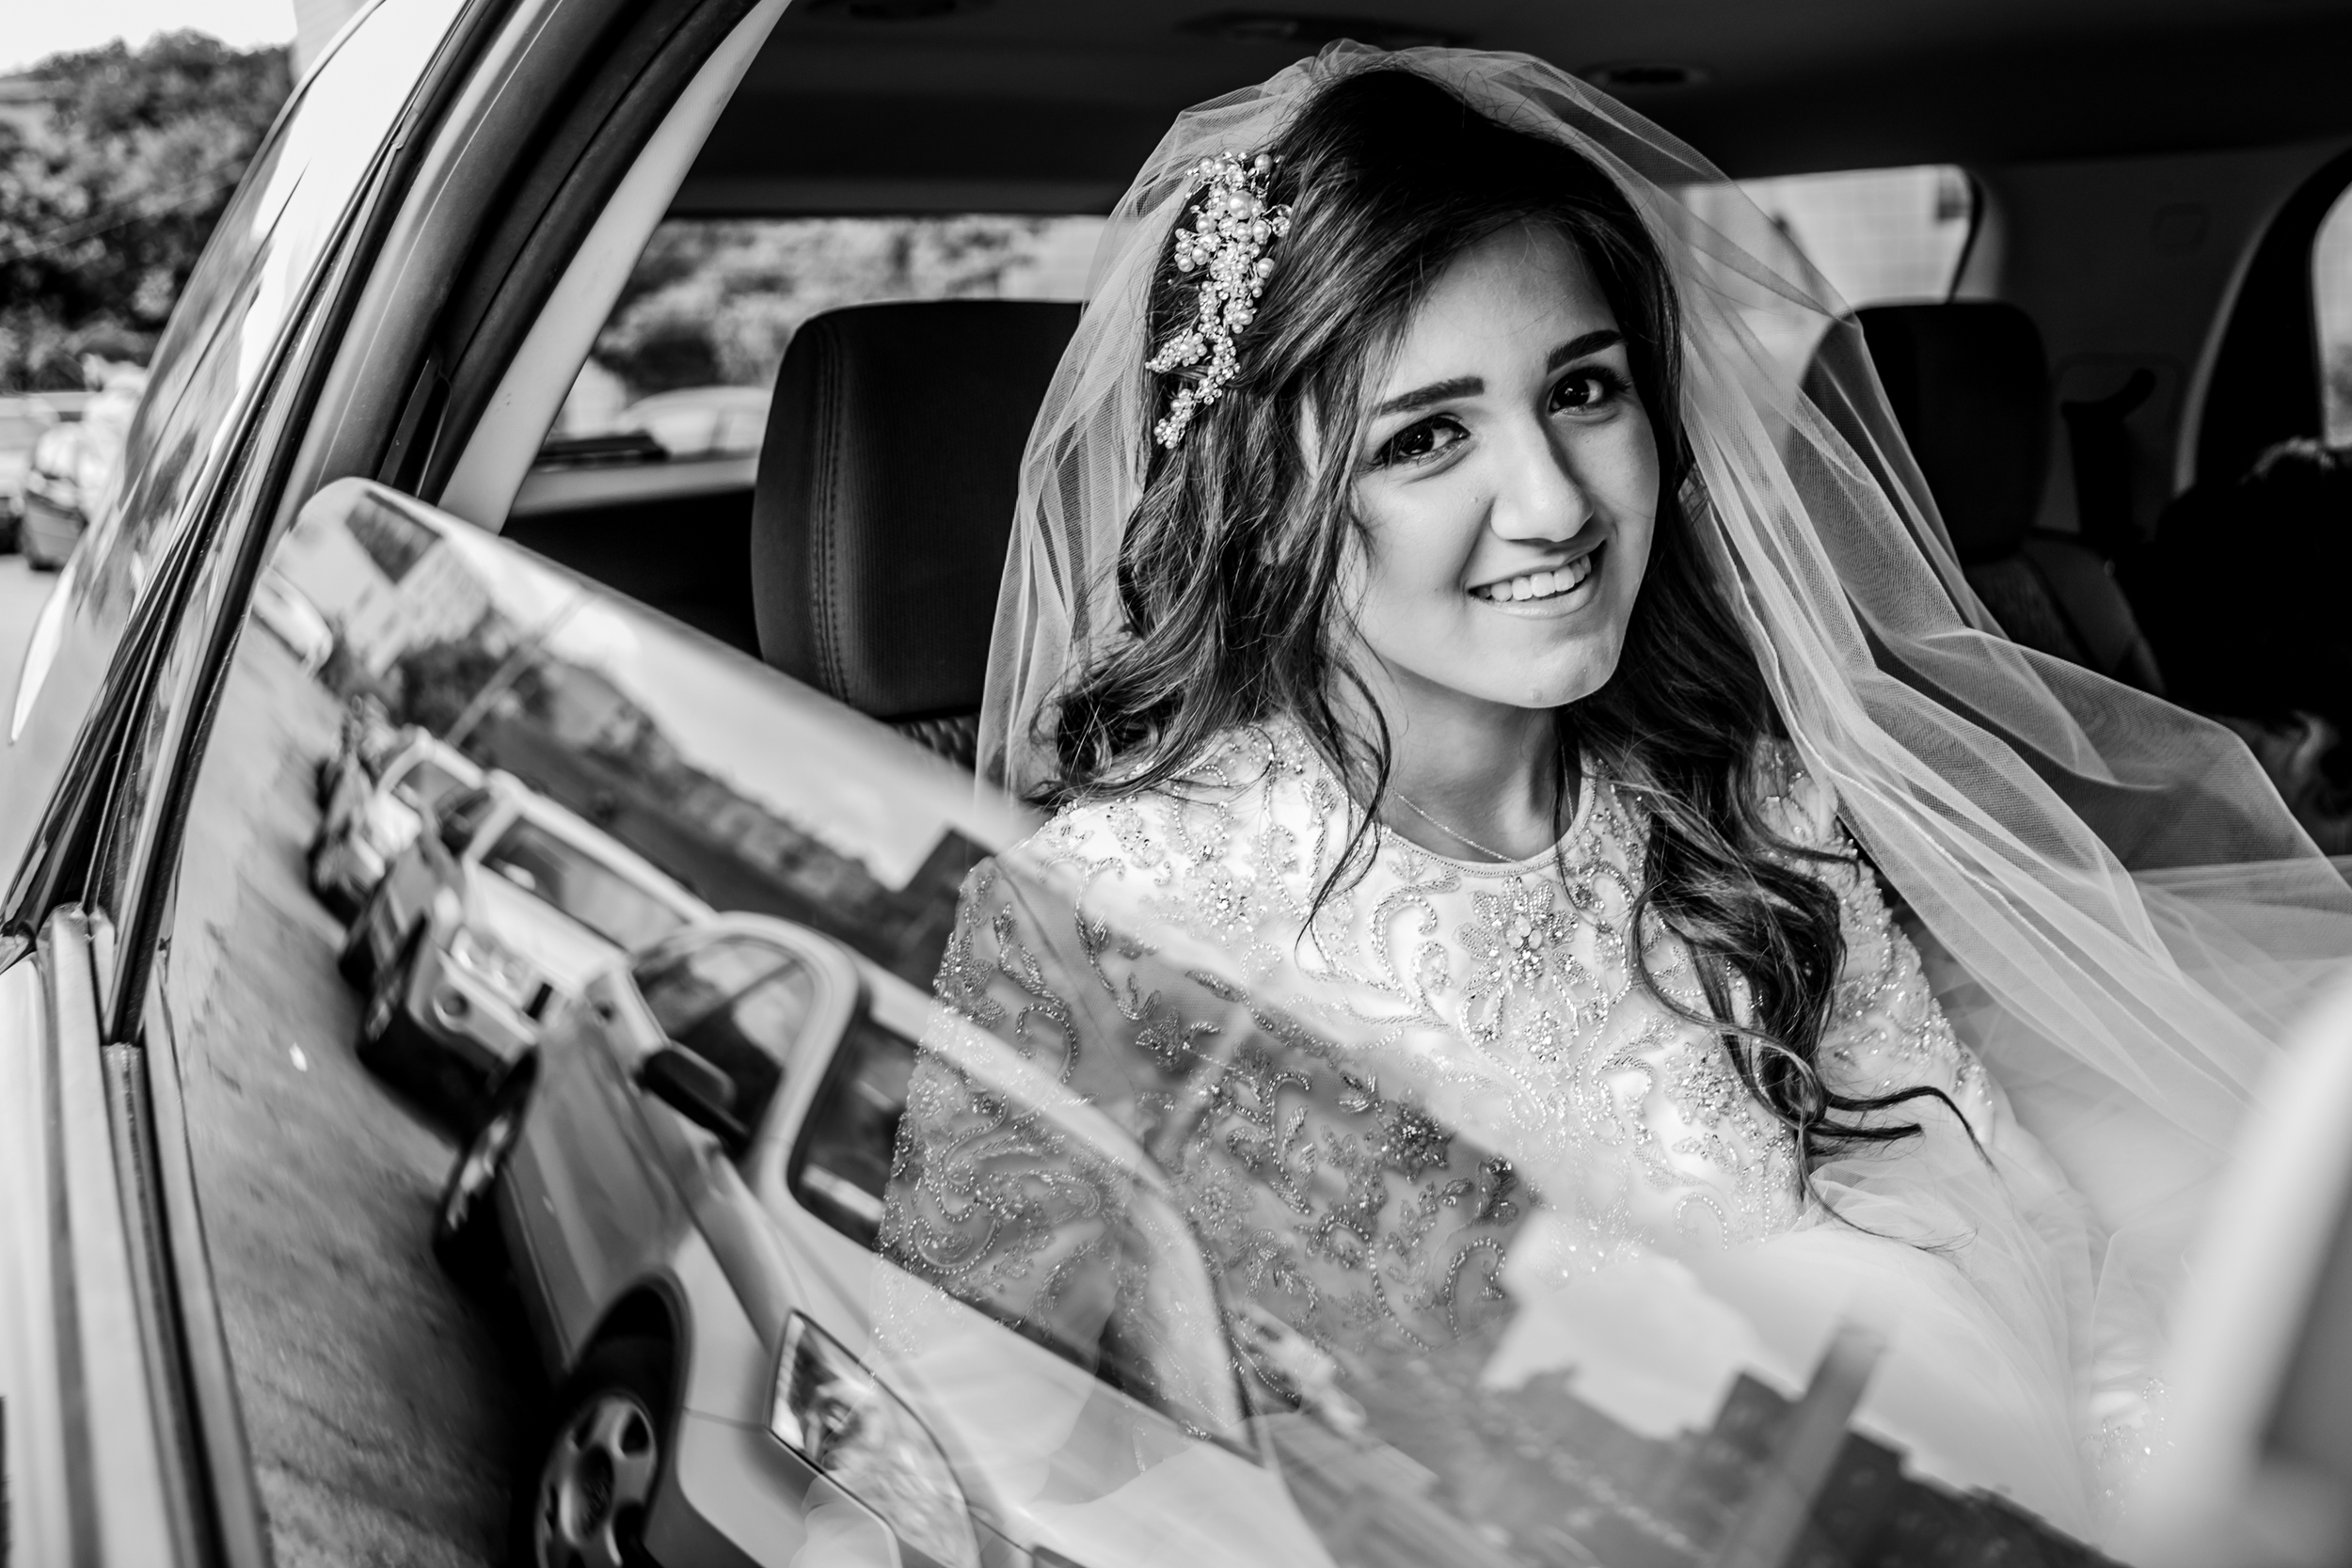 Wedding Iossi and Gitty Khafif  - Eliau Piha studio photography, new york, events, people 770 brooklyn -0071.jpg